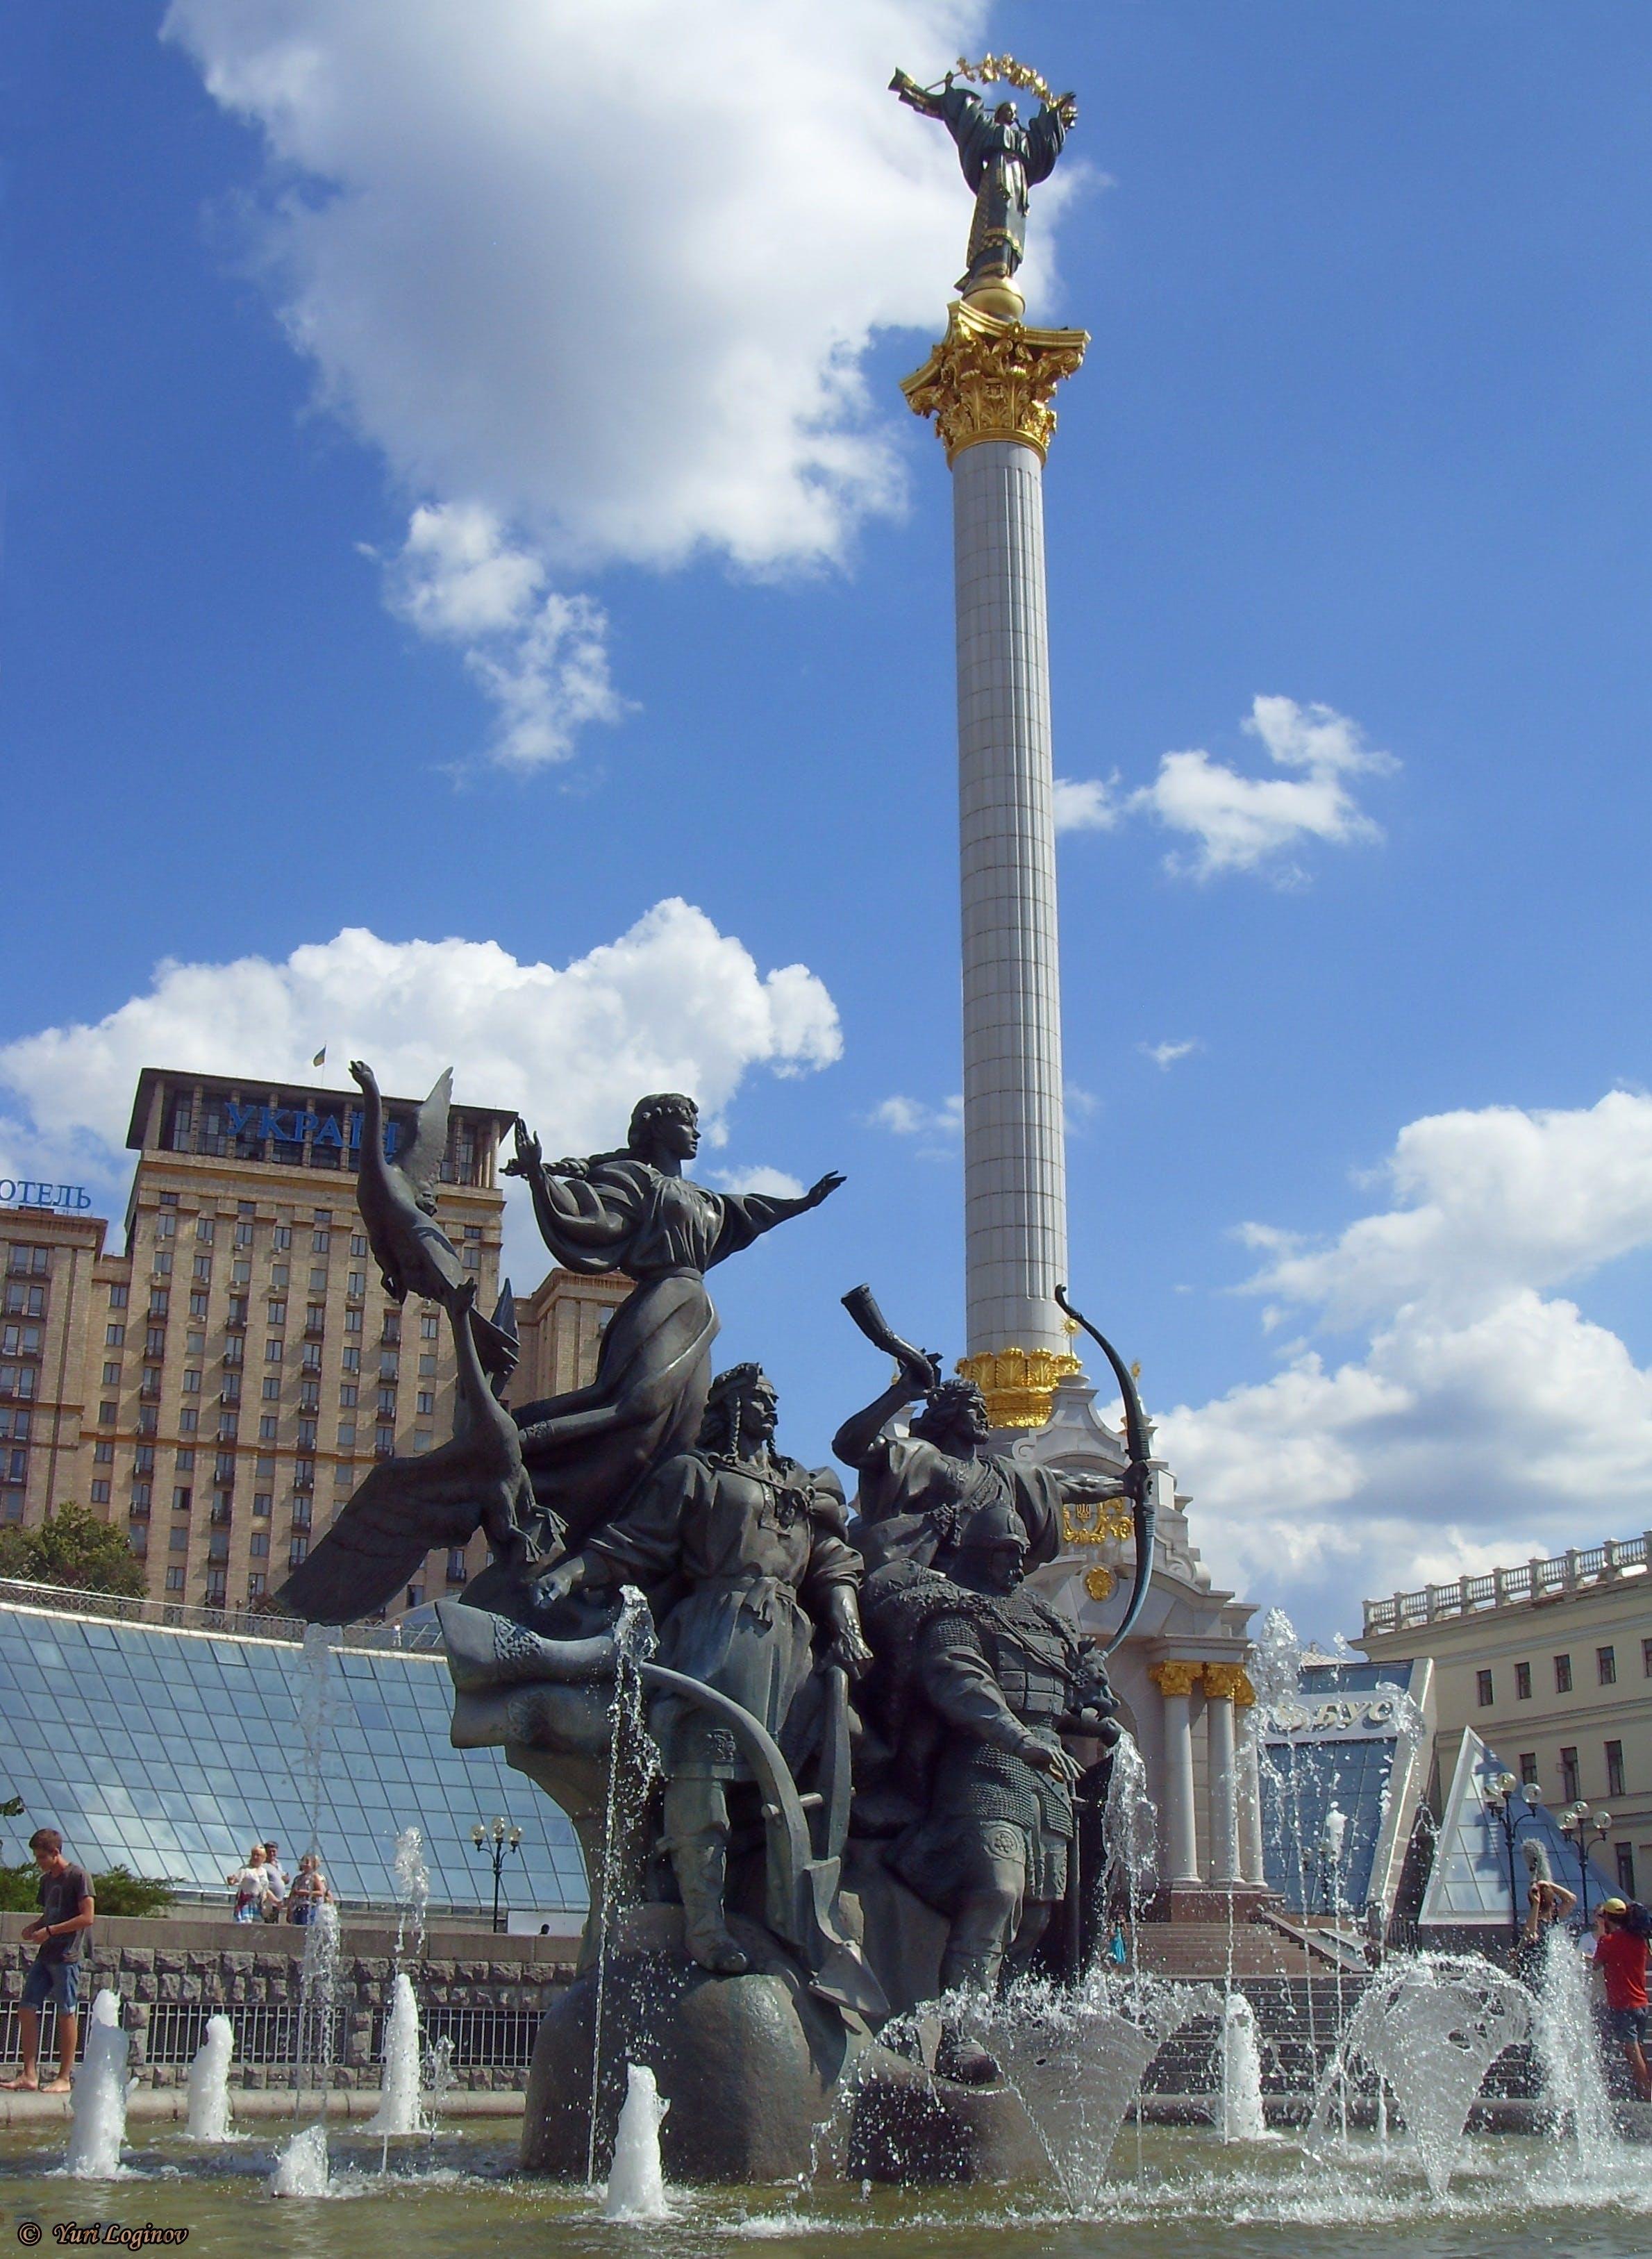 Free stock photo of ukraine, kiev, Київ, Украïна